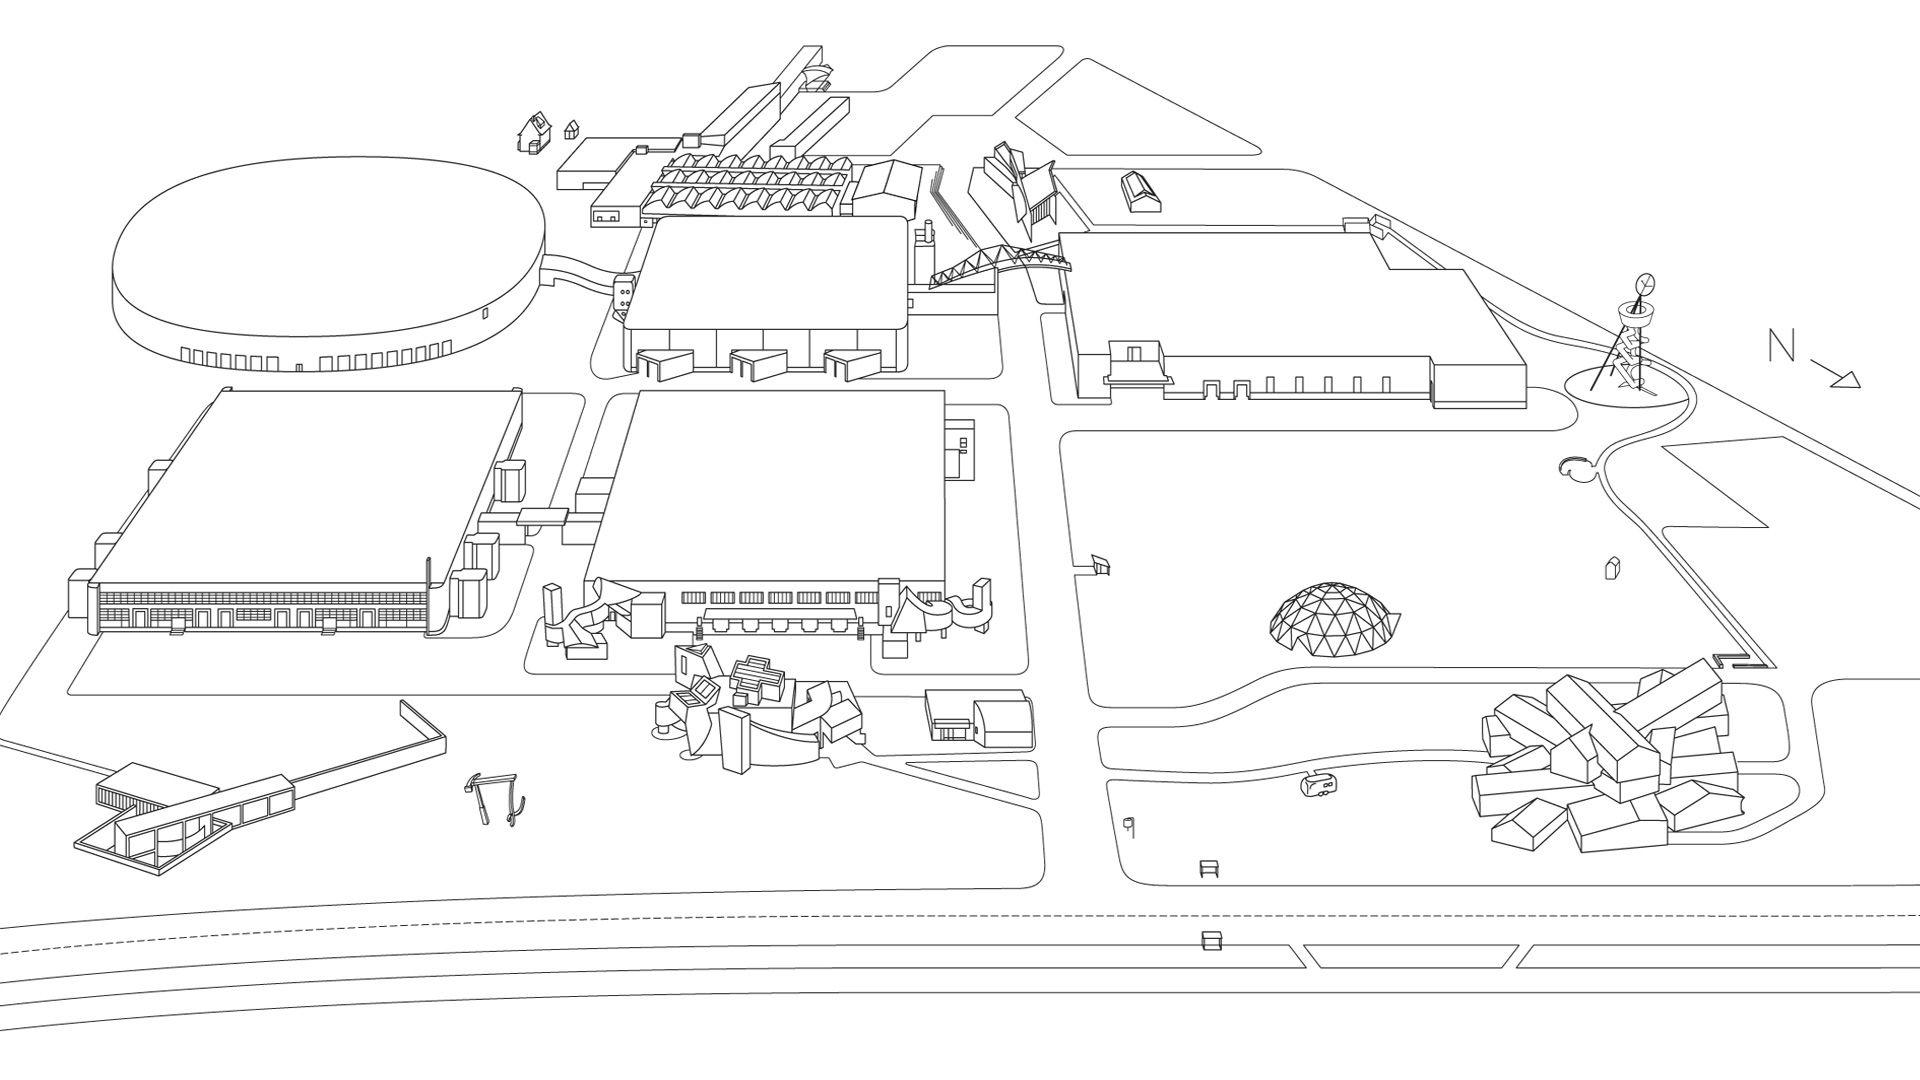 Vitra Campus Architektur